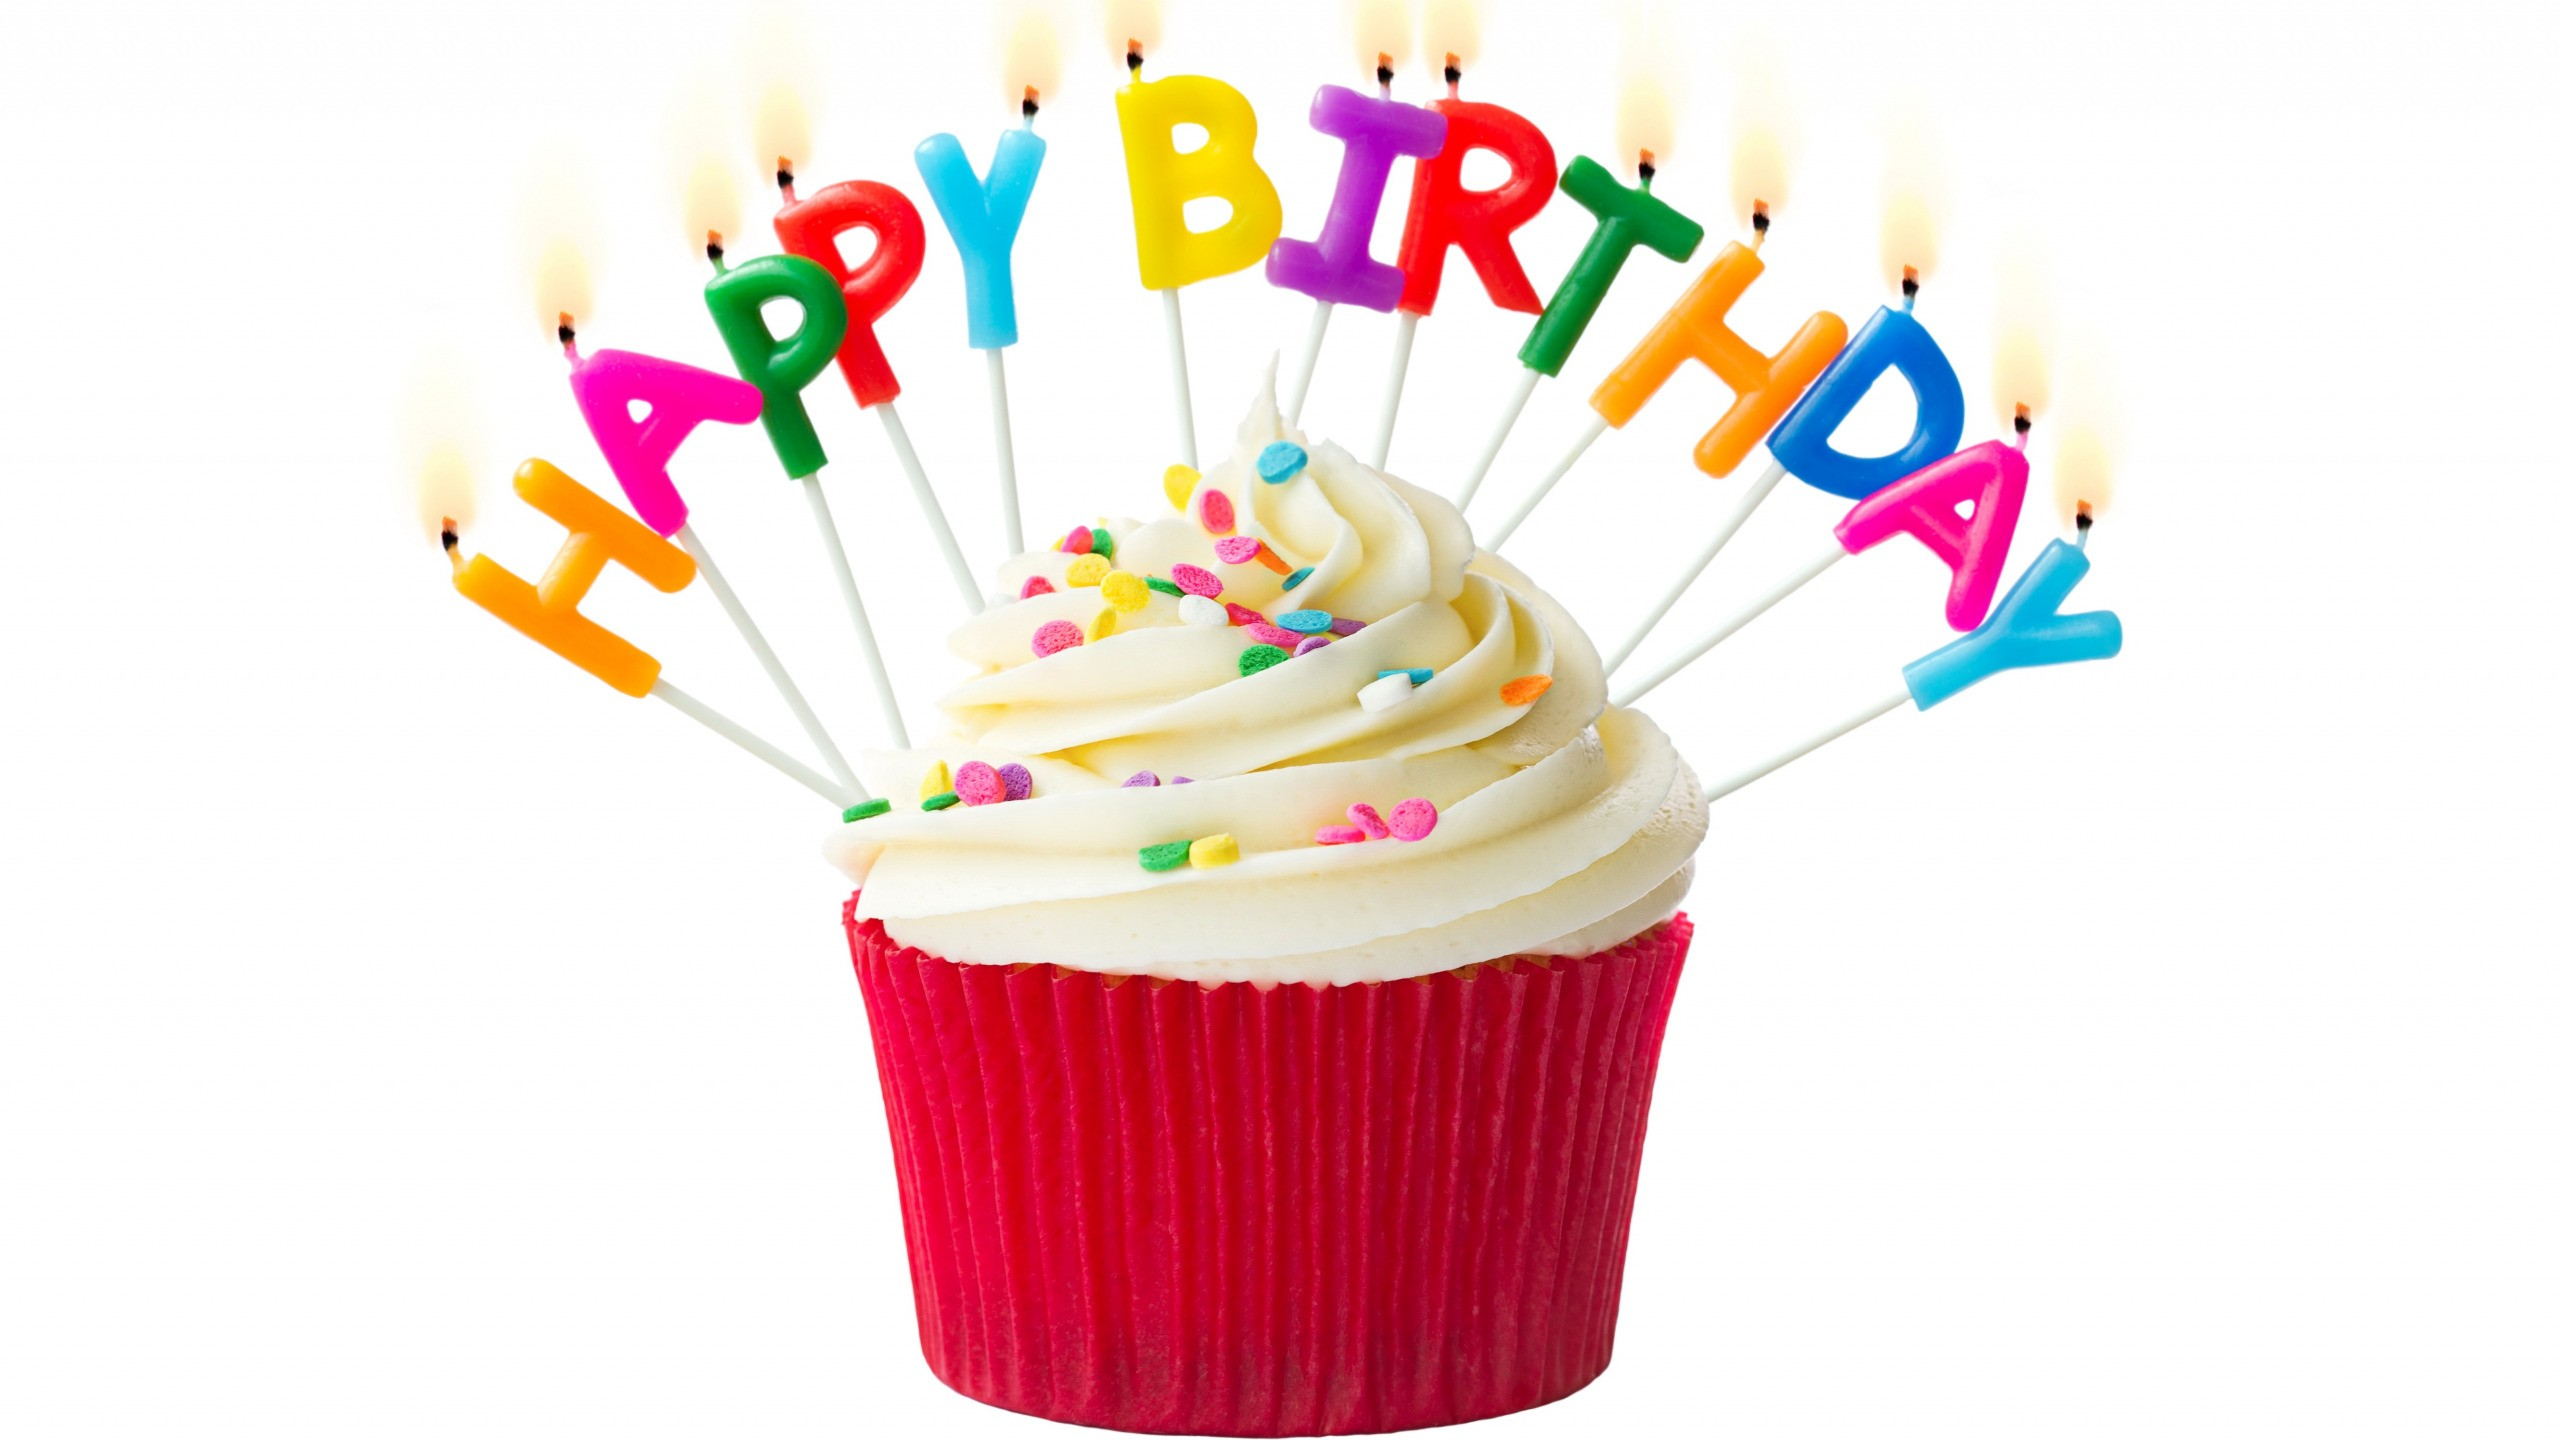 Birthday Cake computer background